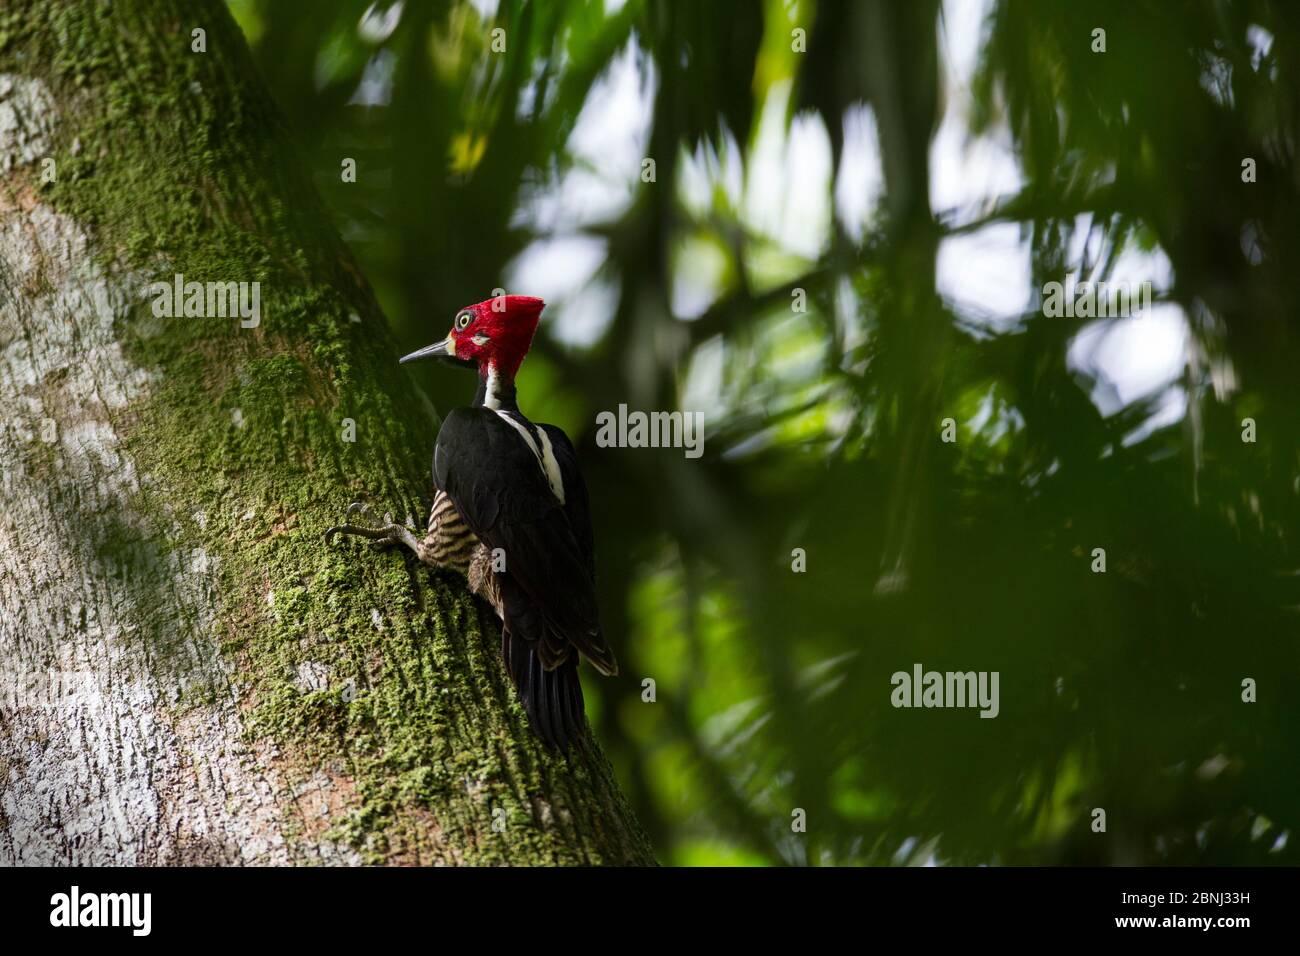 Purpurspecht (Campephilus melanoleucos) auf Baum, tropischer Regenwald. Barro Colorado Insel, Gatun See, Panama Kanal, Panama. Stockfoto